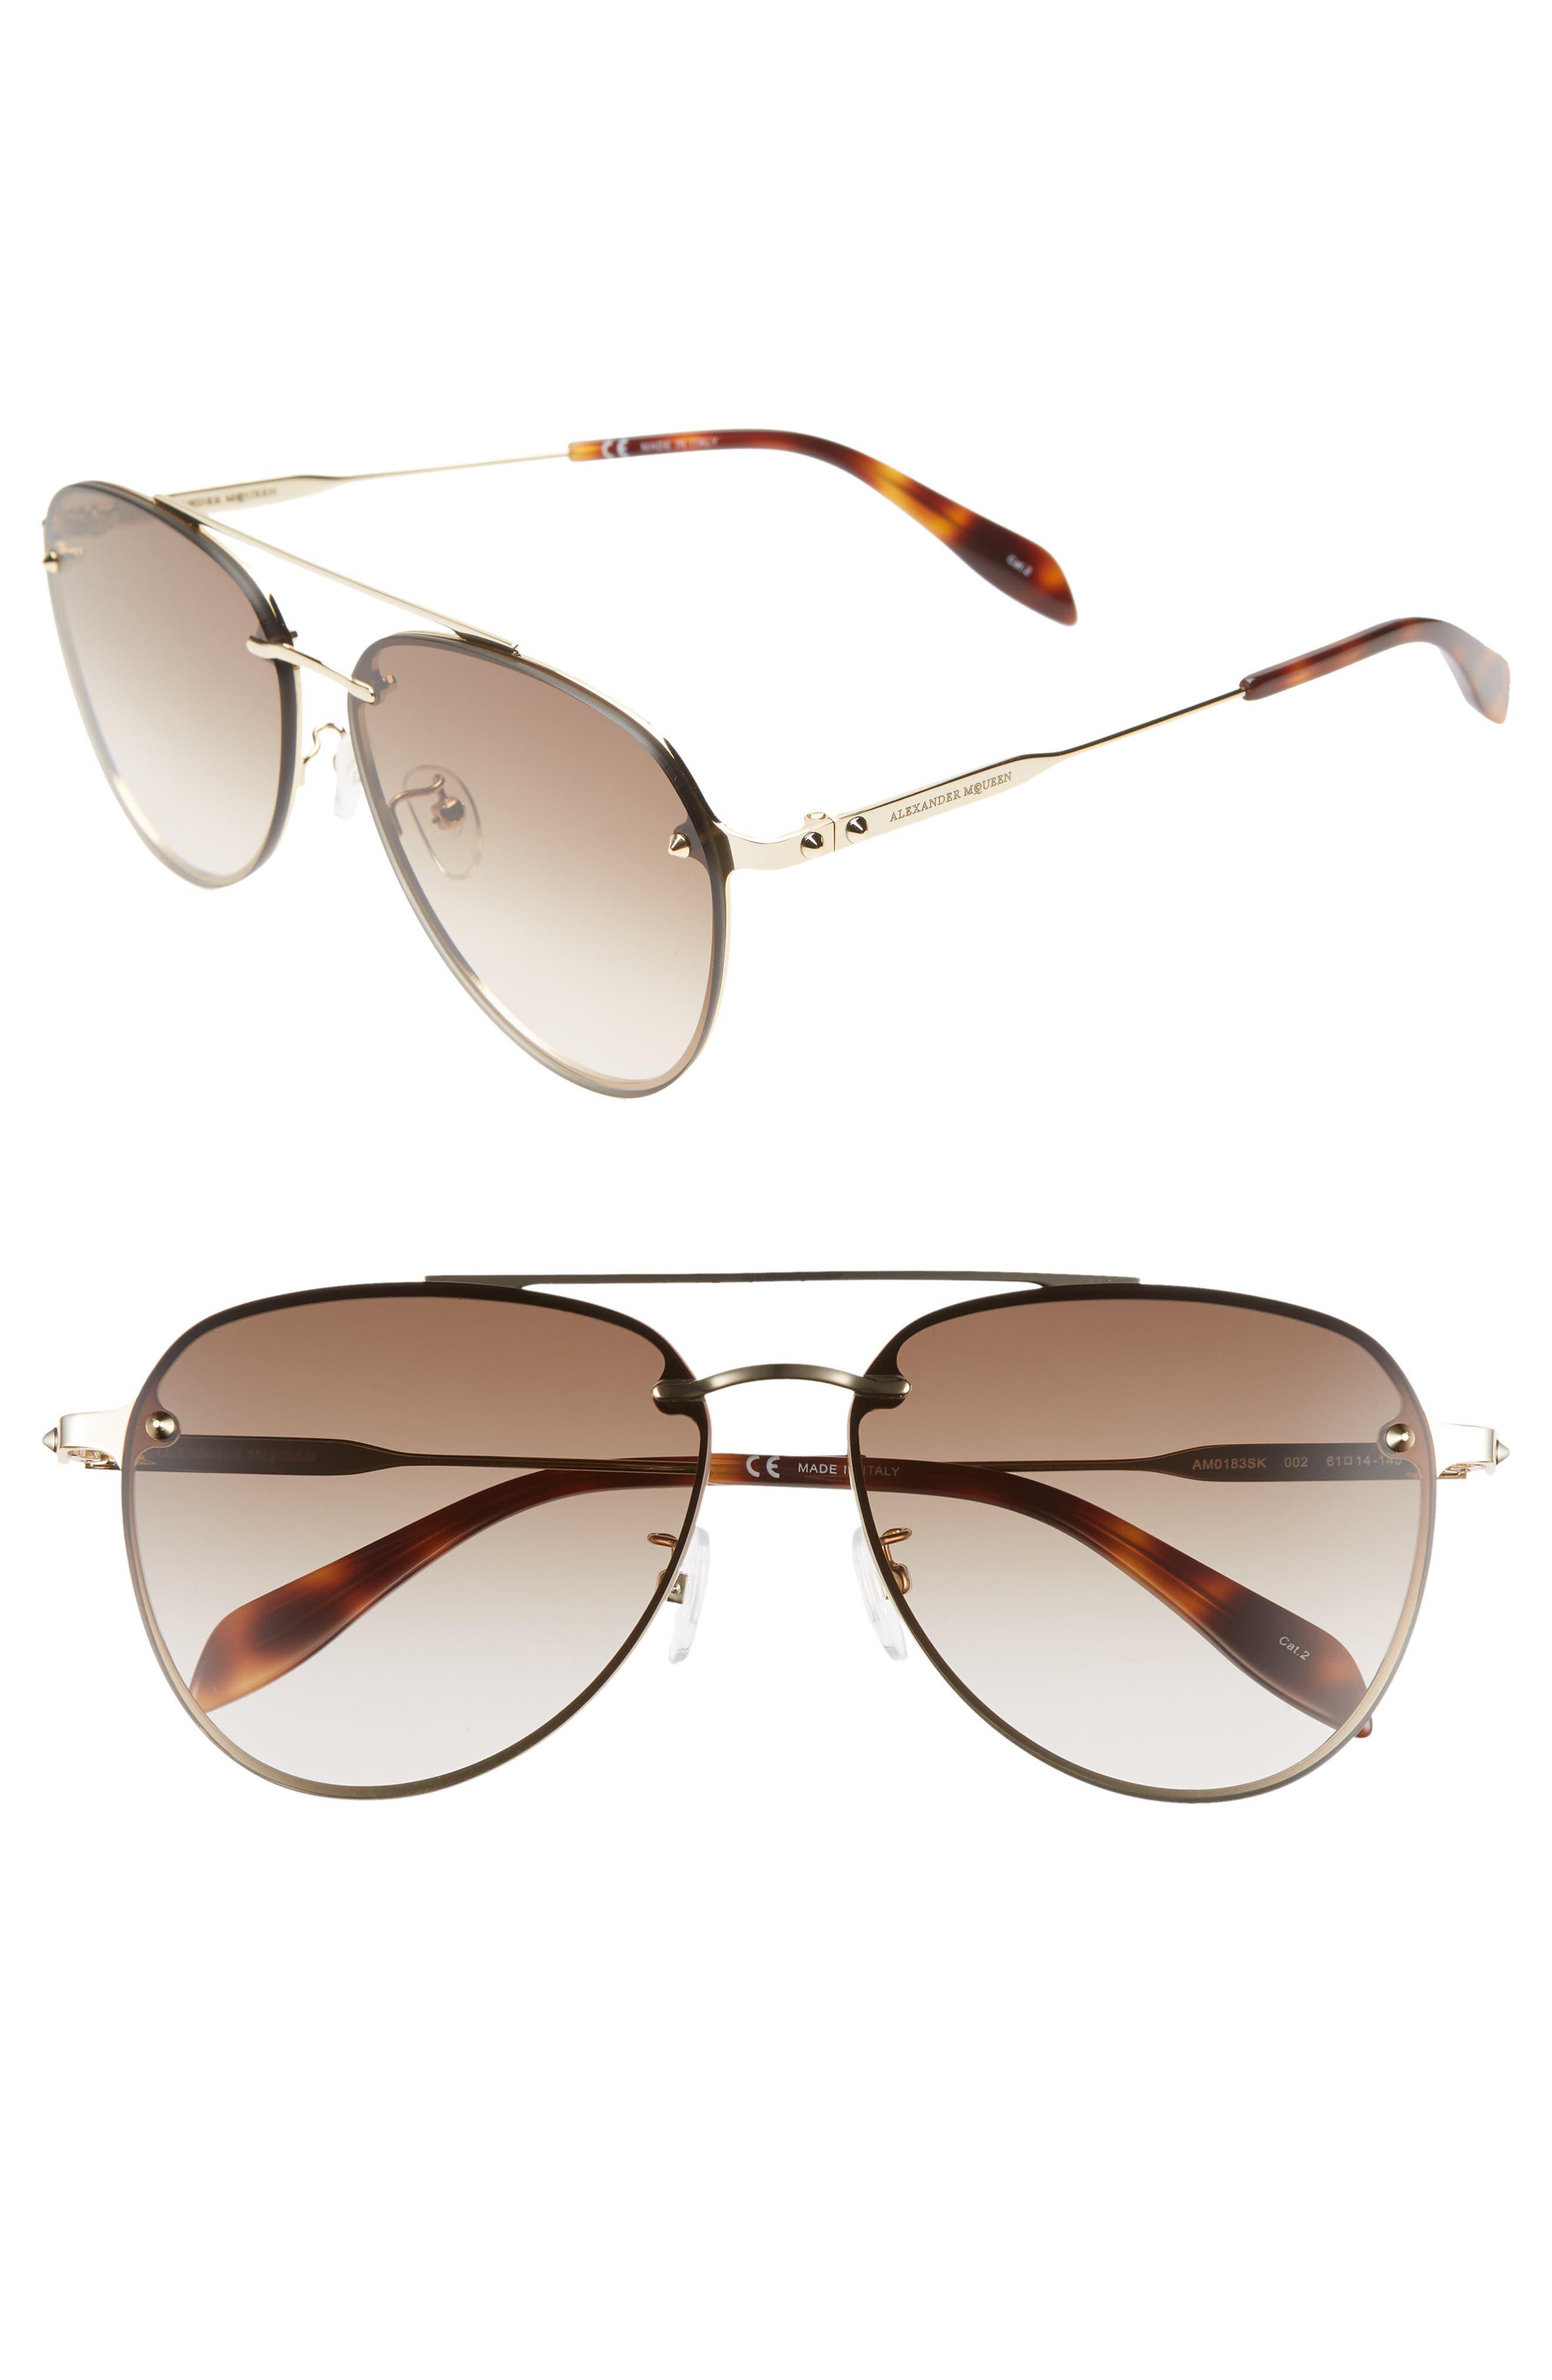 60d5d2126ad9 Buy aviator sunglasses & eyewear for women - Best women's aviator ...